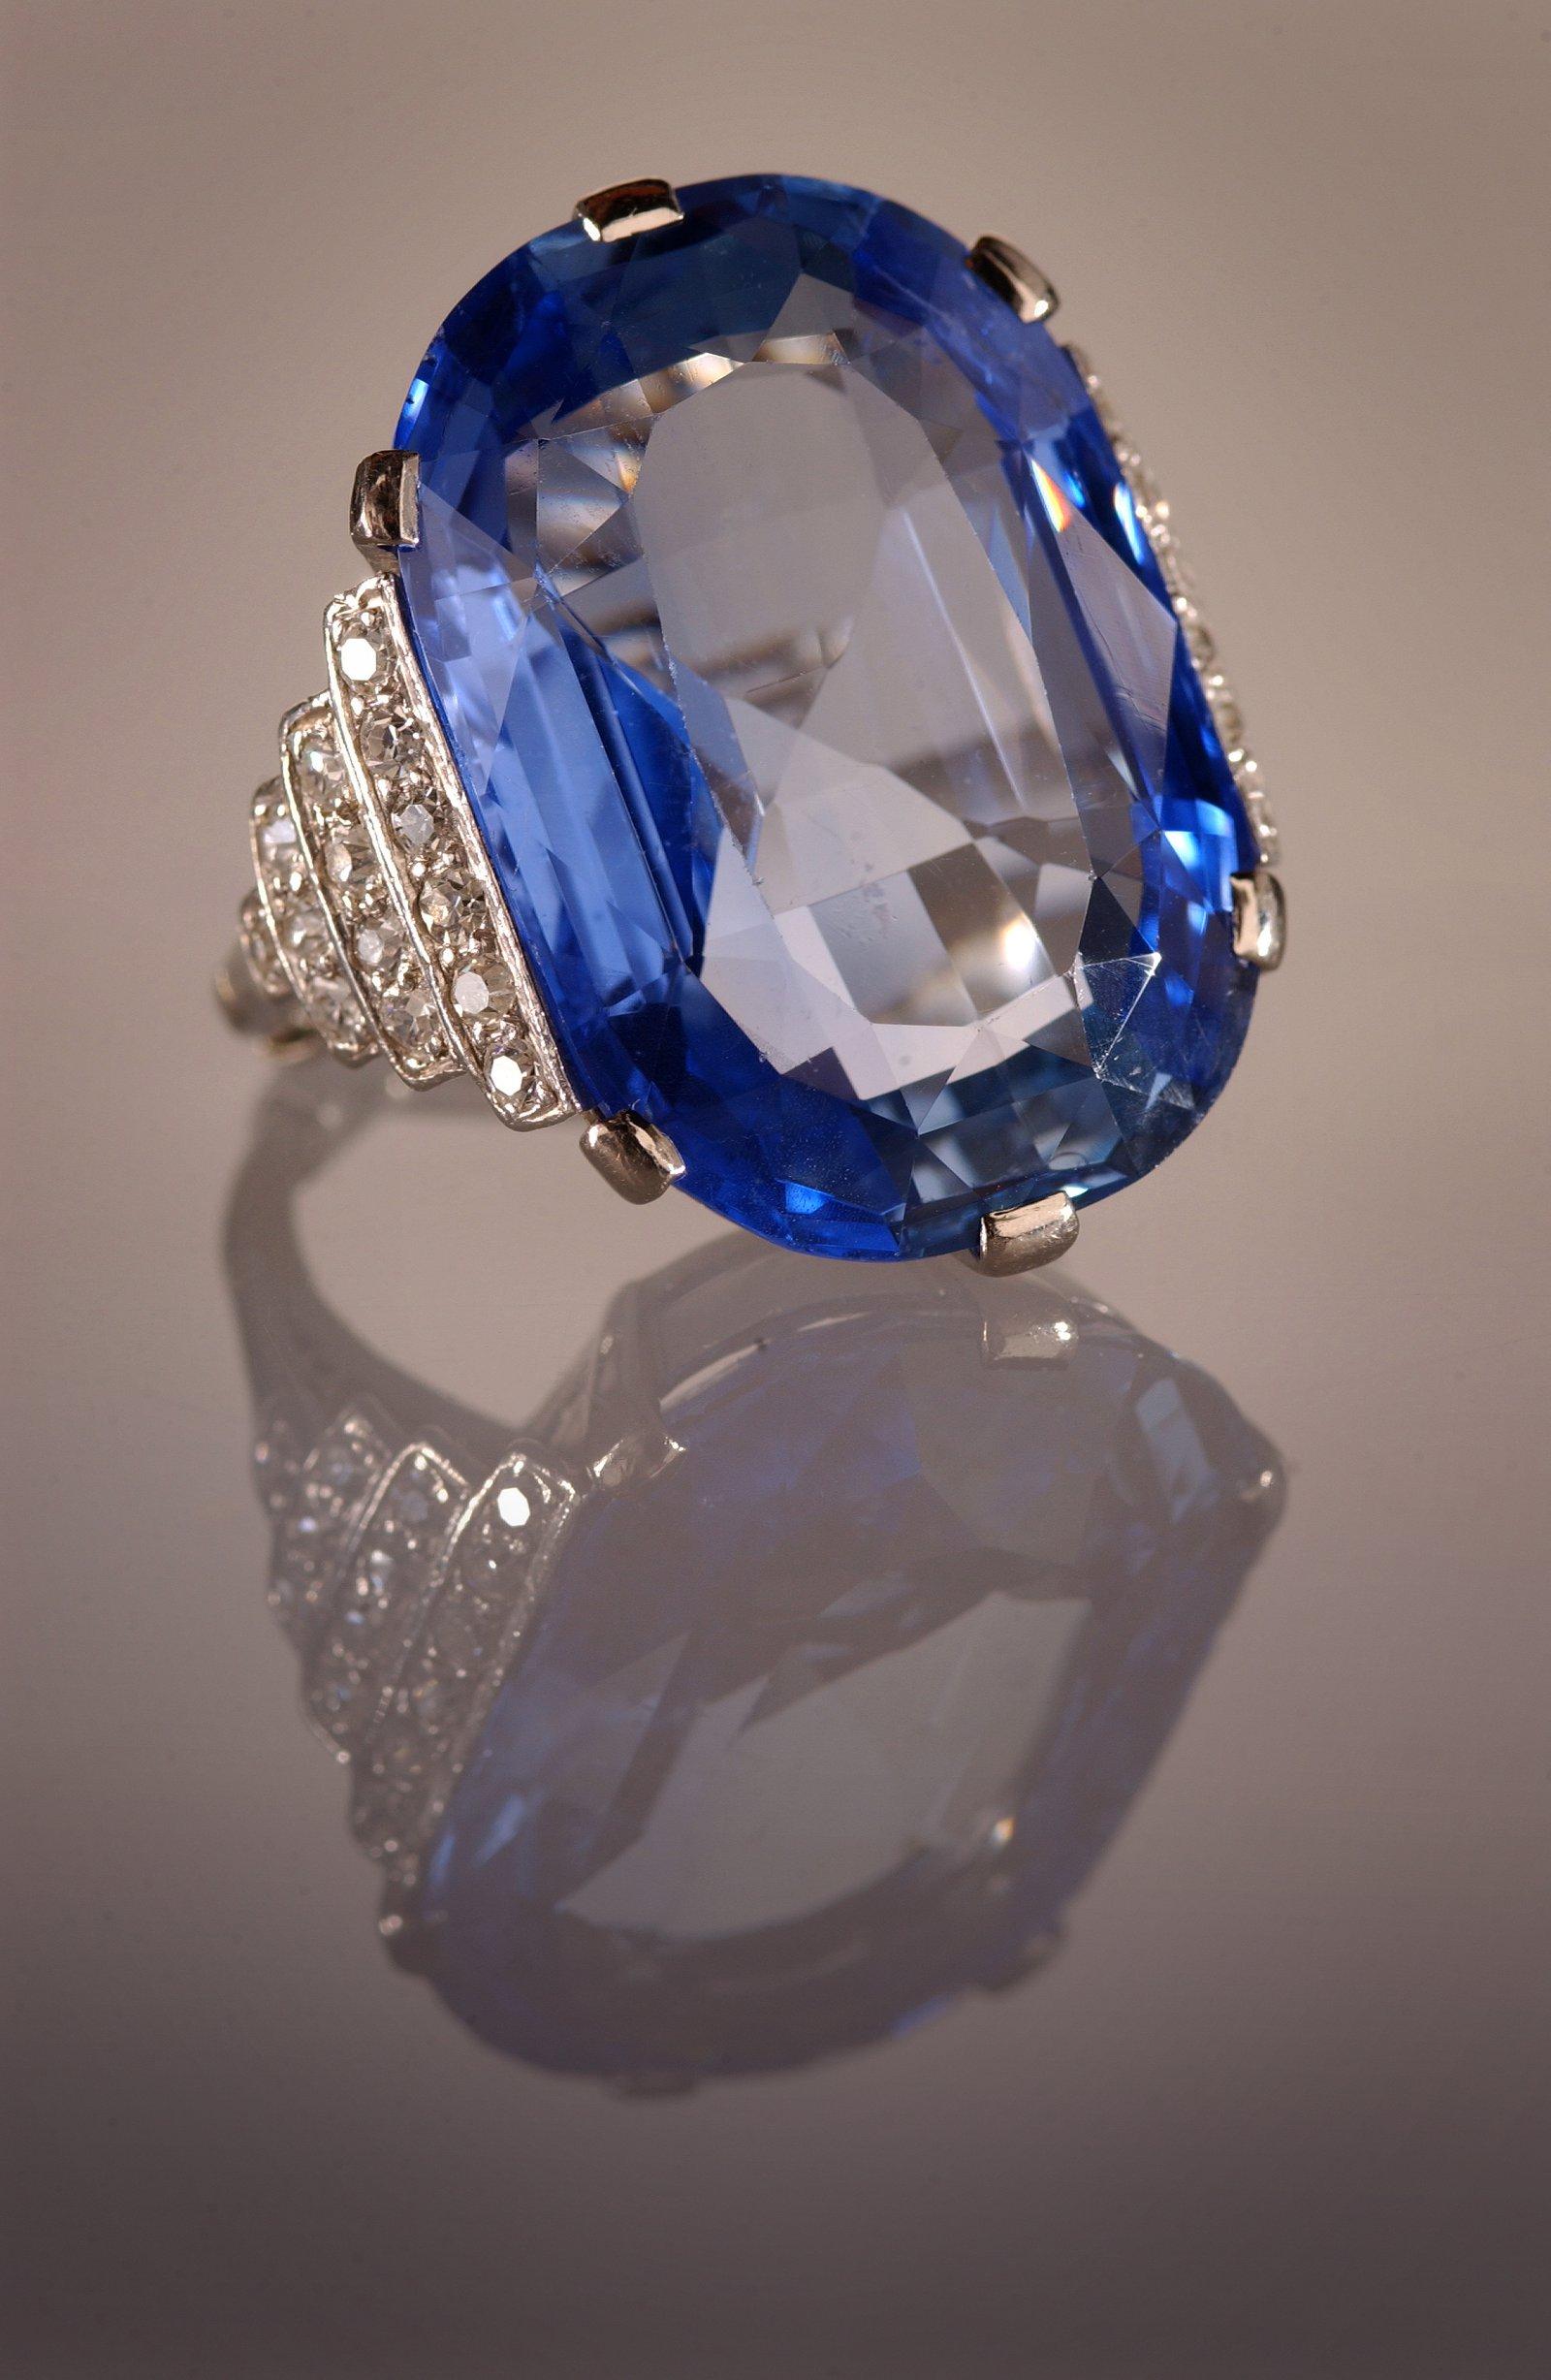 Gemstones The Australian Museum